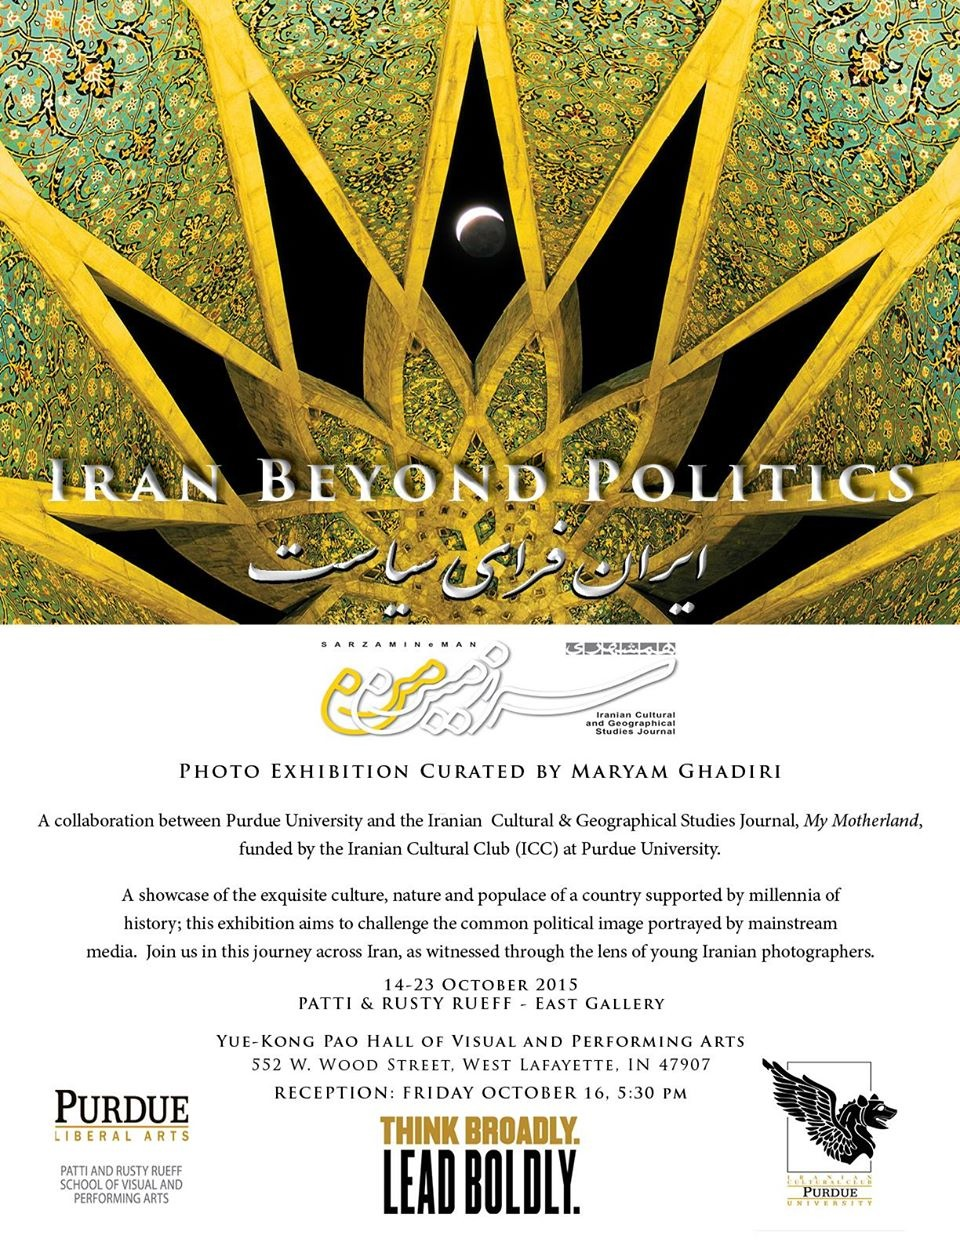 iranbeyondpolitics